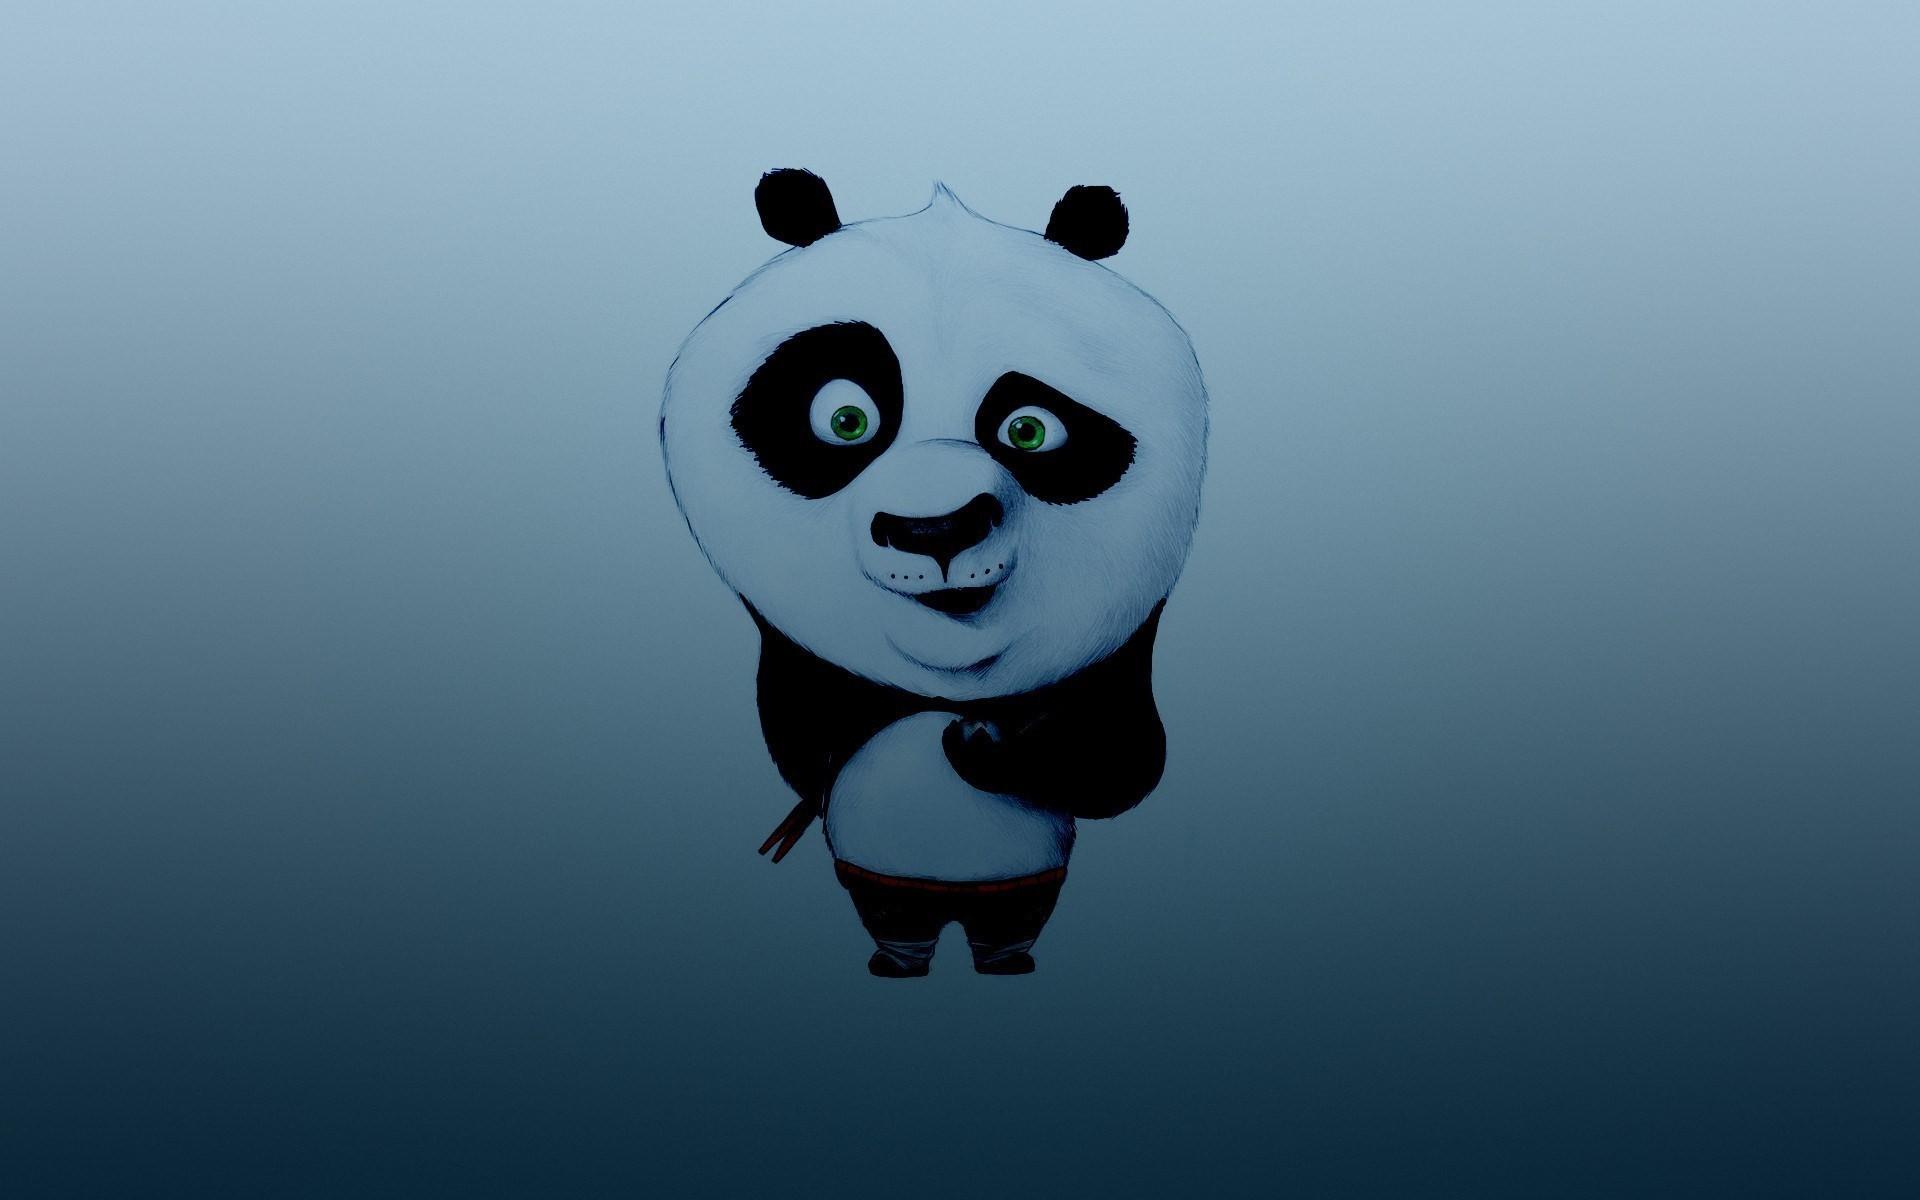 … Kung Fu Panda Art Funny HD Wallpaper | FreeWallsUp